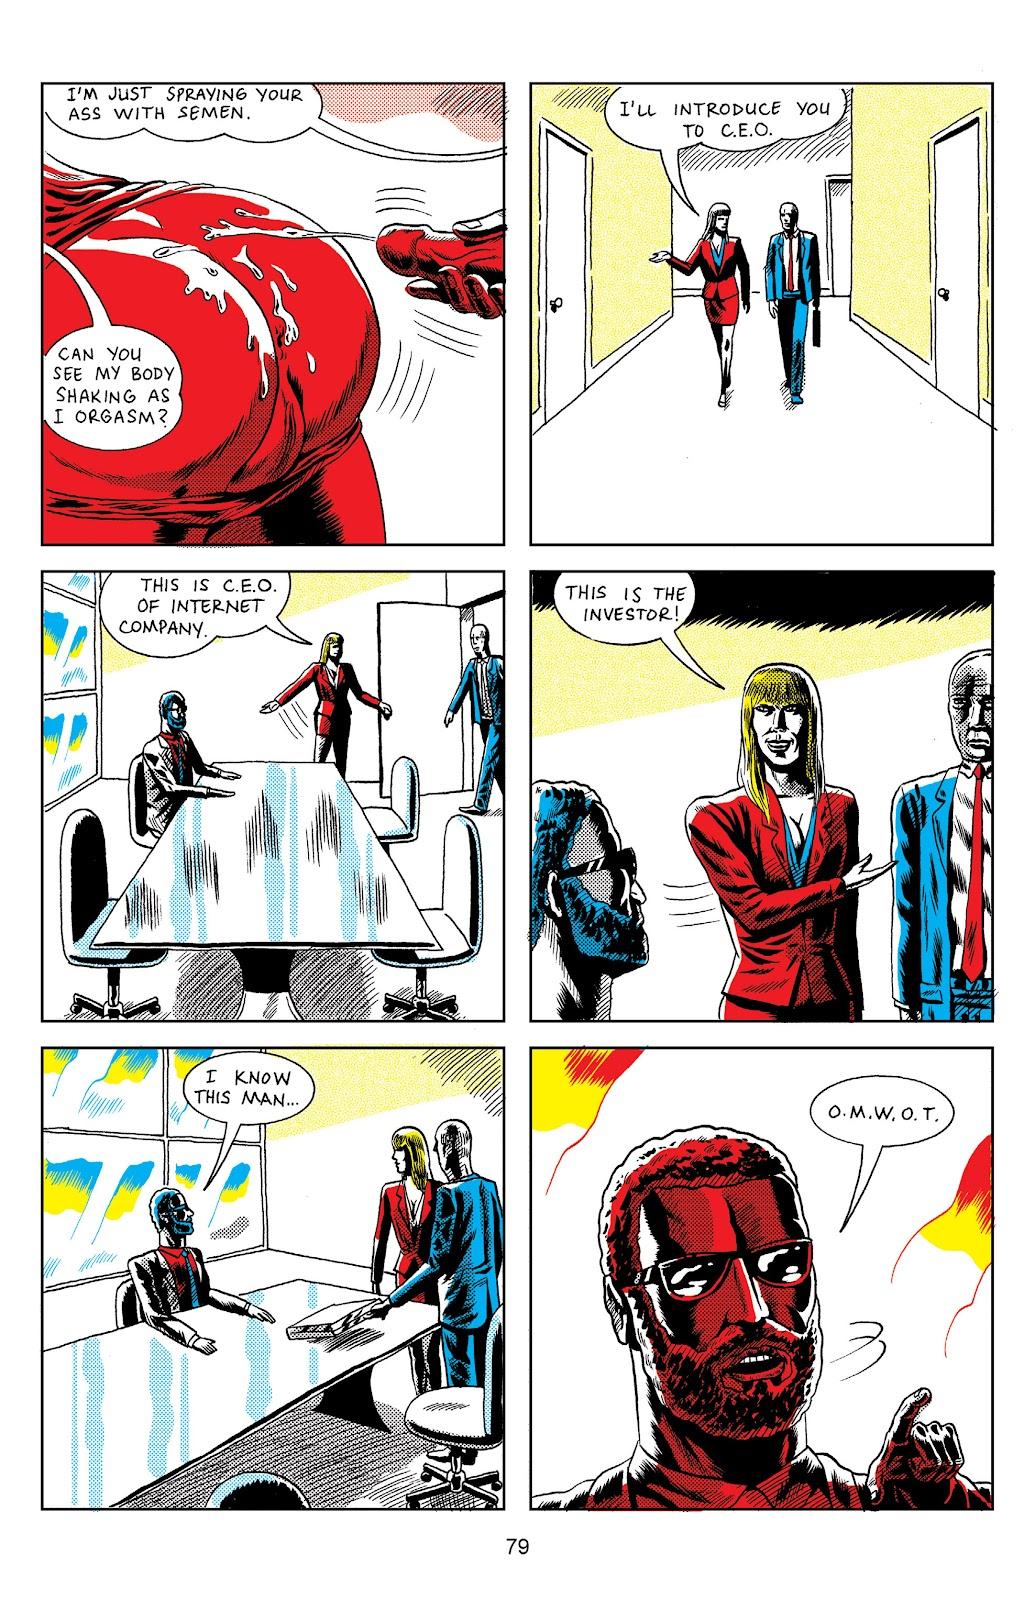 Read online Terror Assaulter: O.M.W.O.T (One Man War On Terror) comic -  Issue # TPB - 79